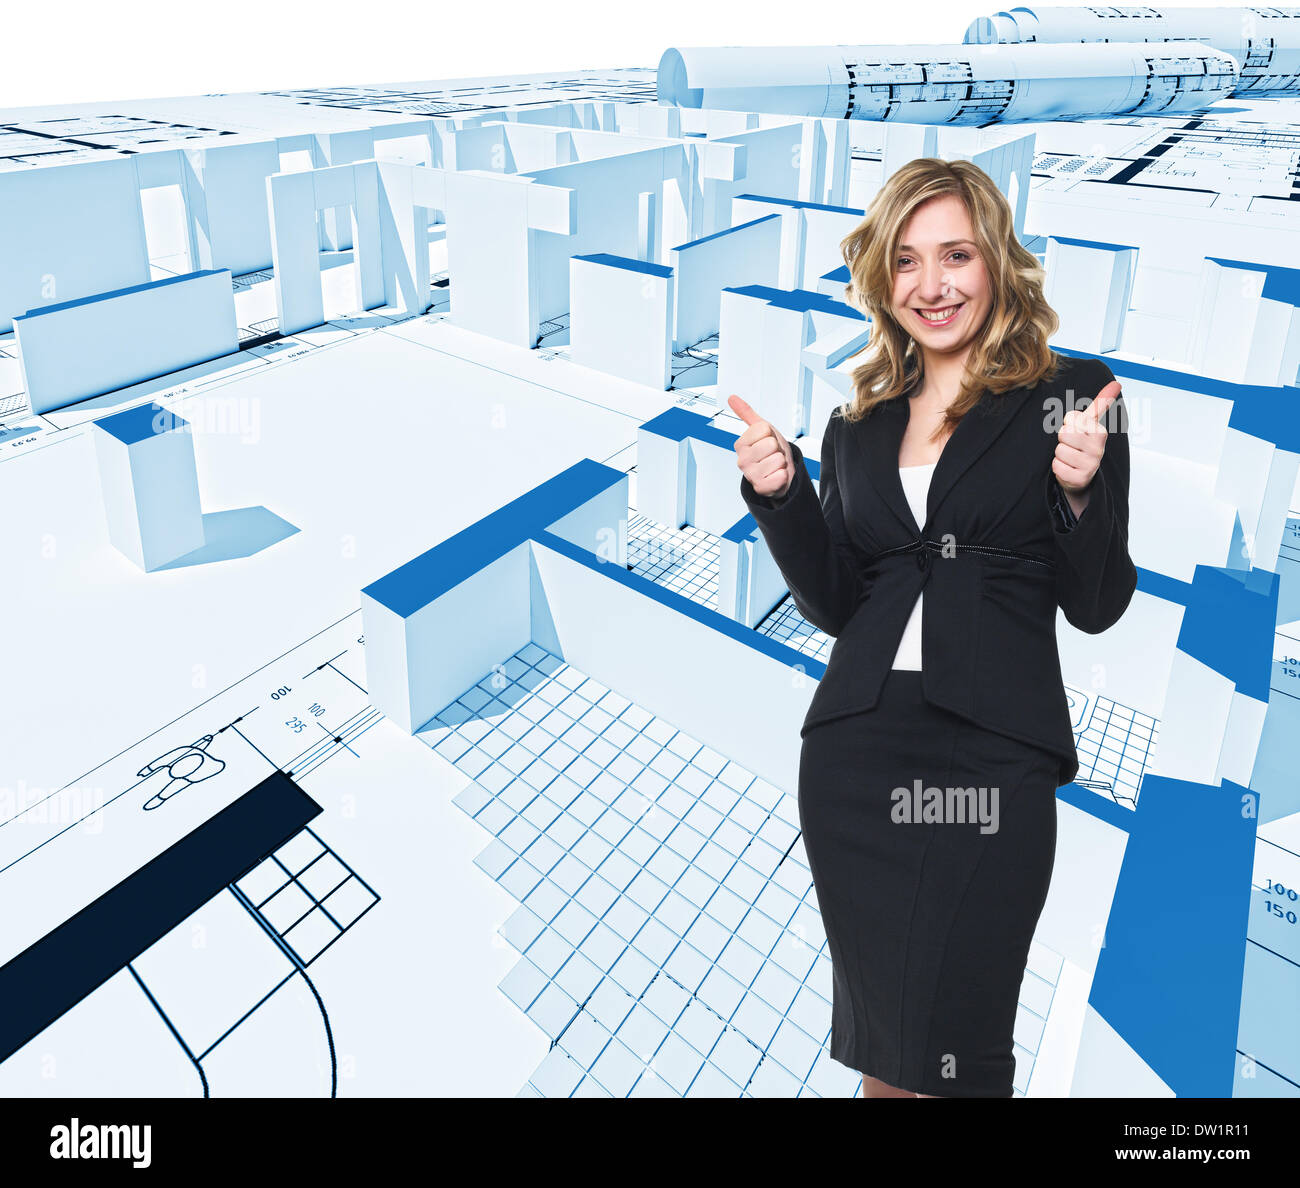 woman and blueprint - Stock Image